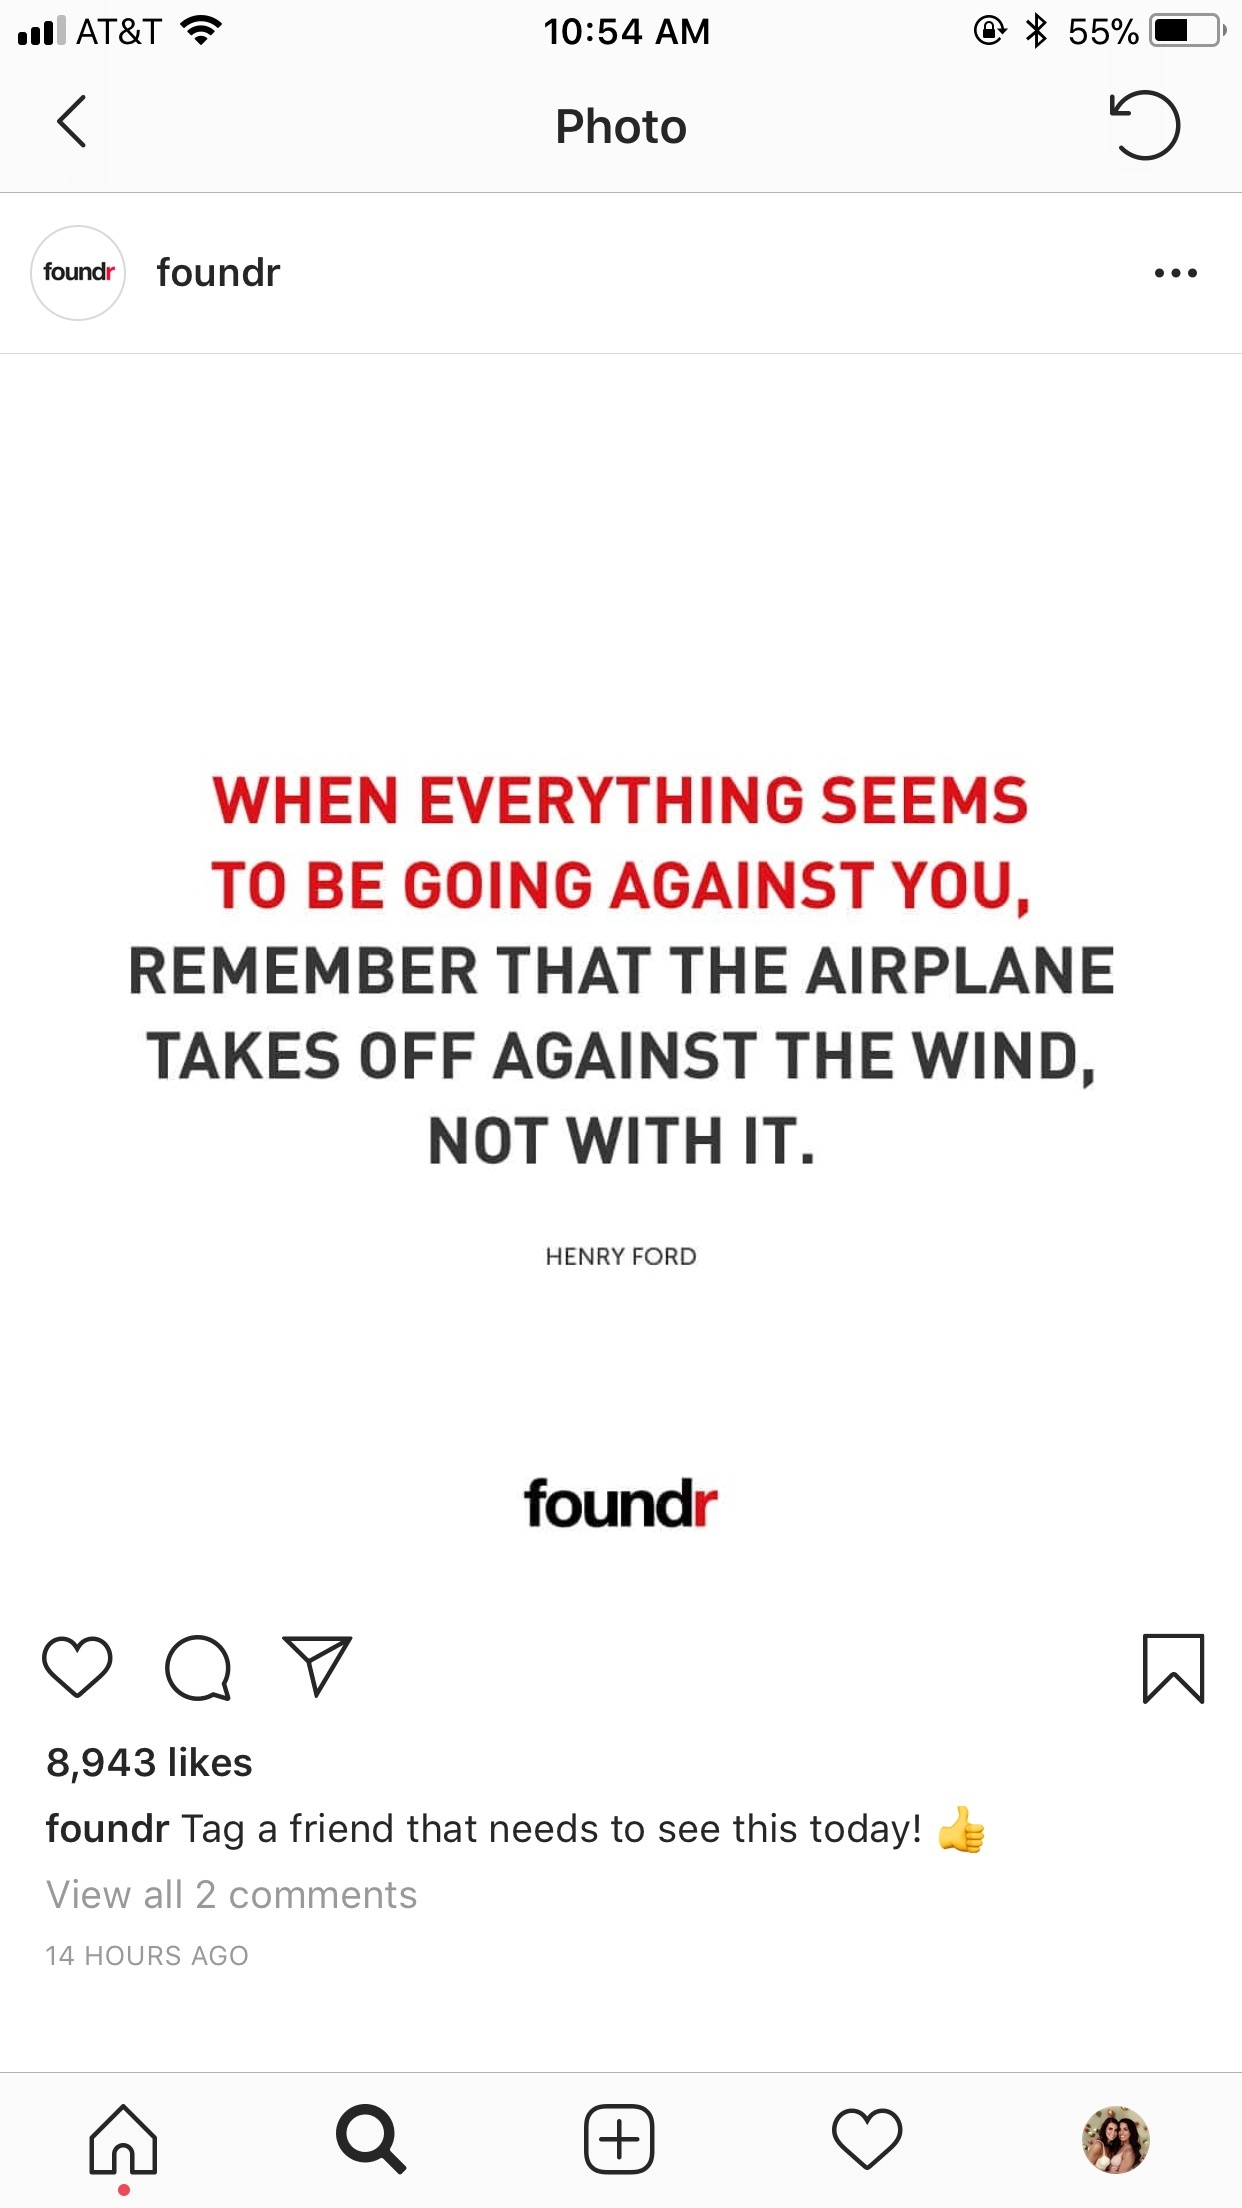 instagram-marketing-14